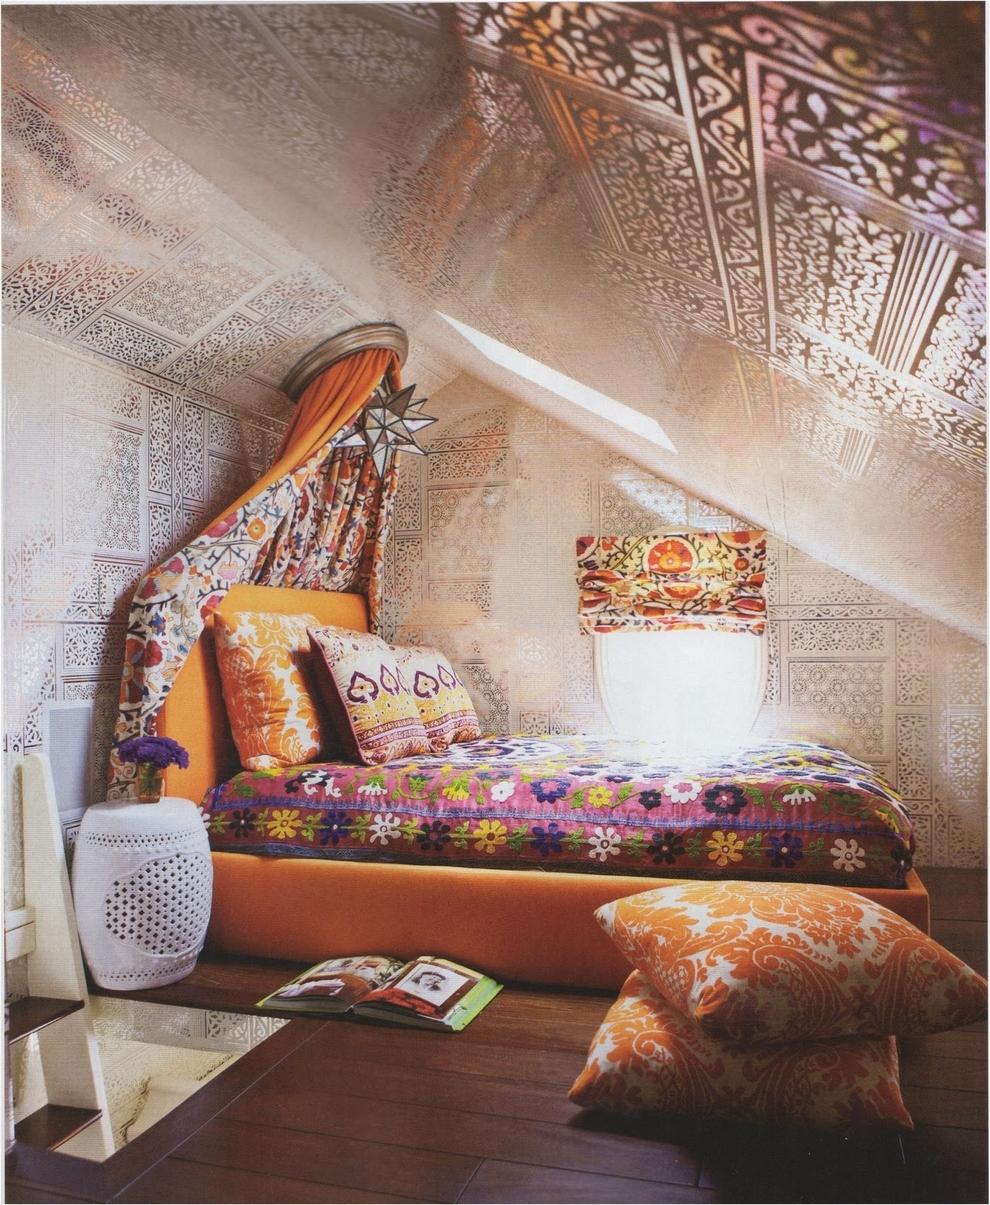 Small bohemian apartment: small bedroom ideas bohemian decorating ...